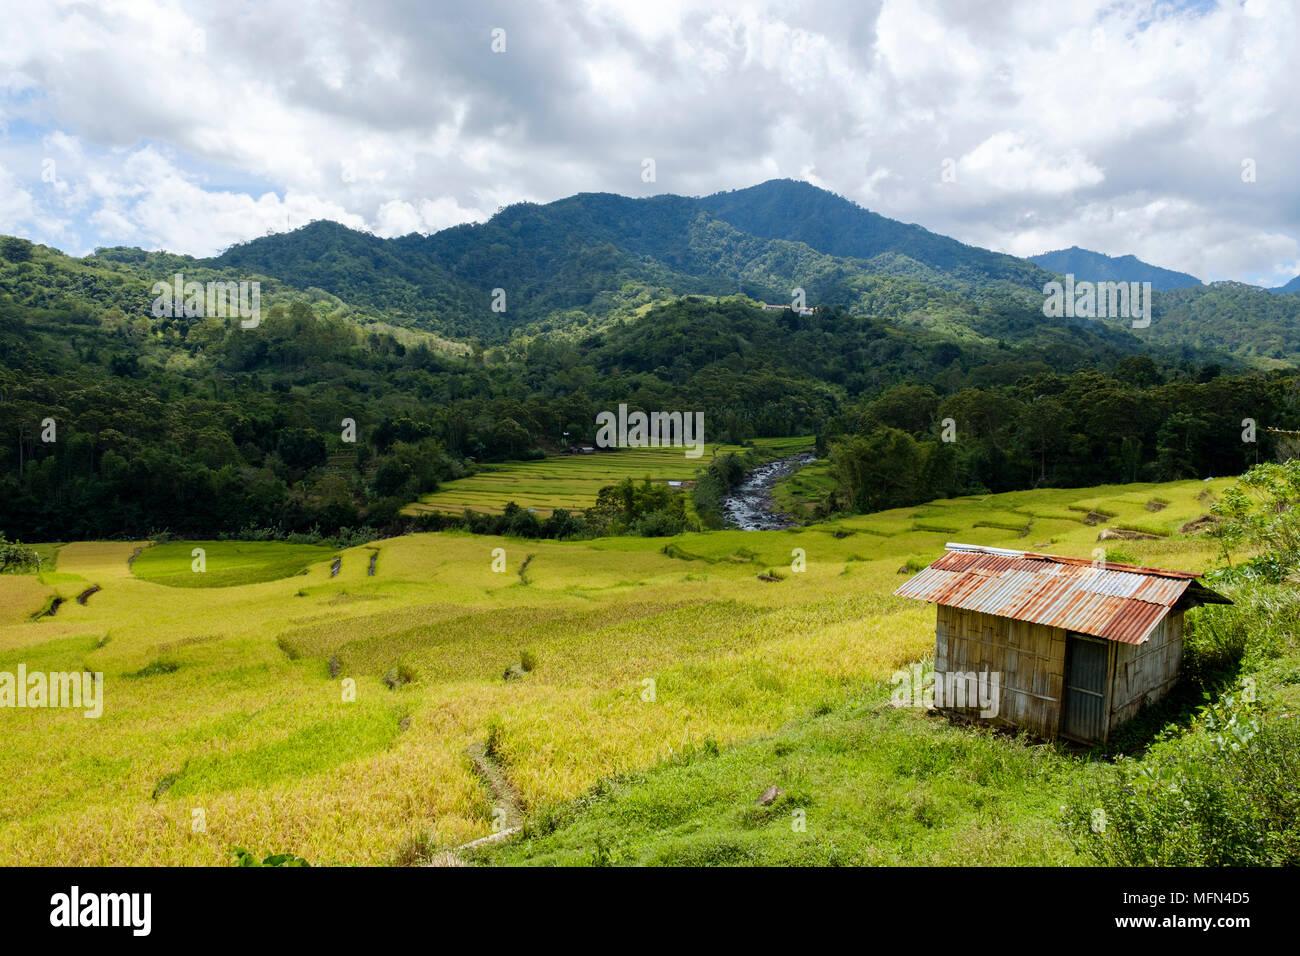 A hut overlooking verdant rice fields near Ende, Flores Island (East NUsa Tenggara), Indonesia. - Stock Image